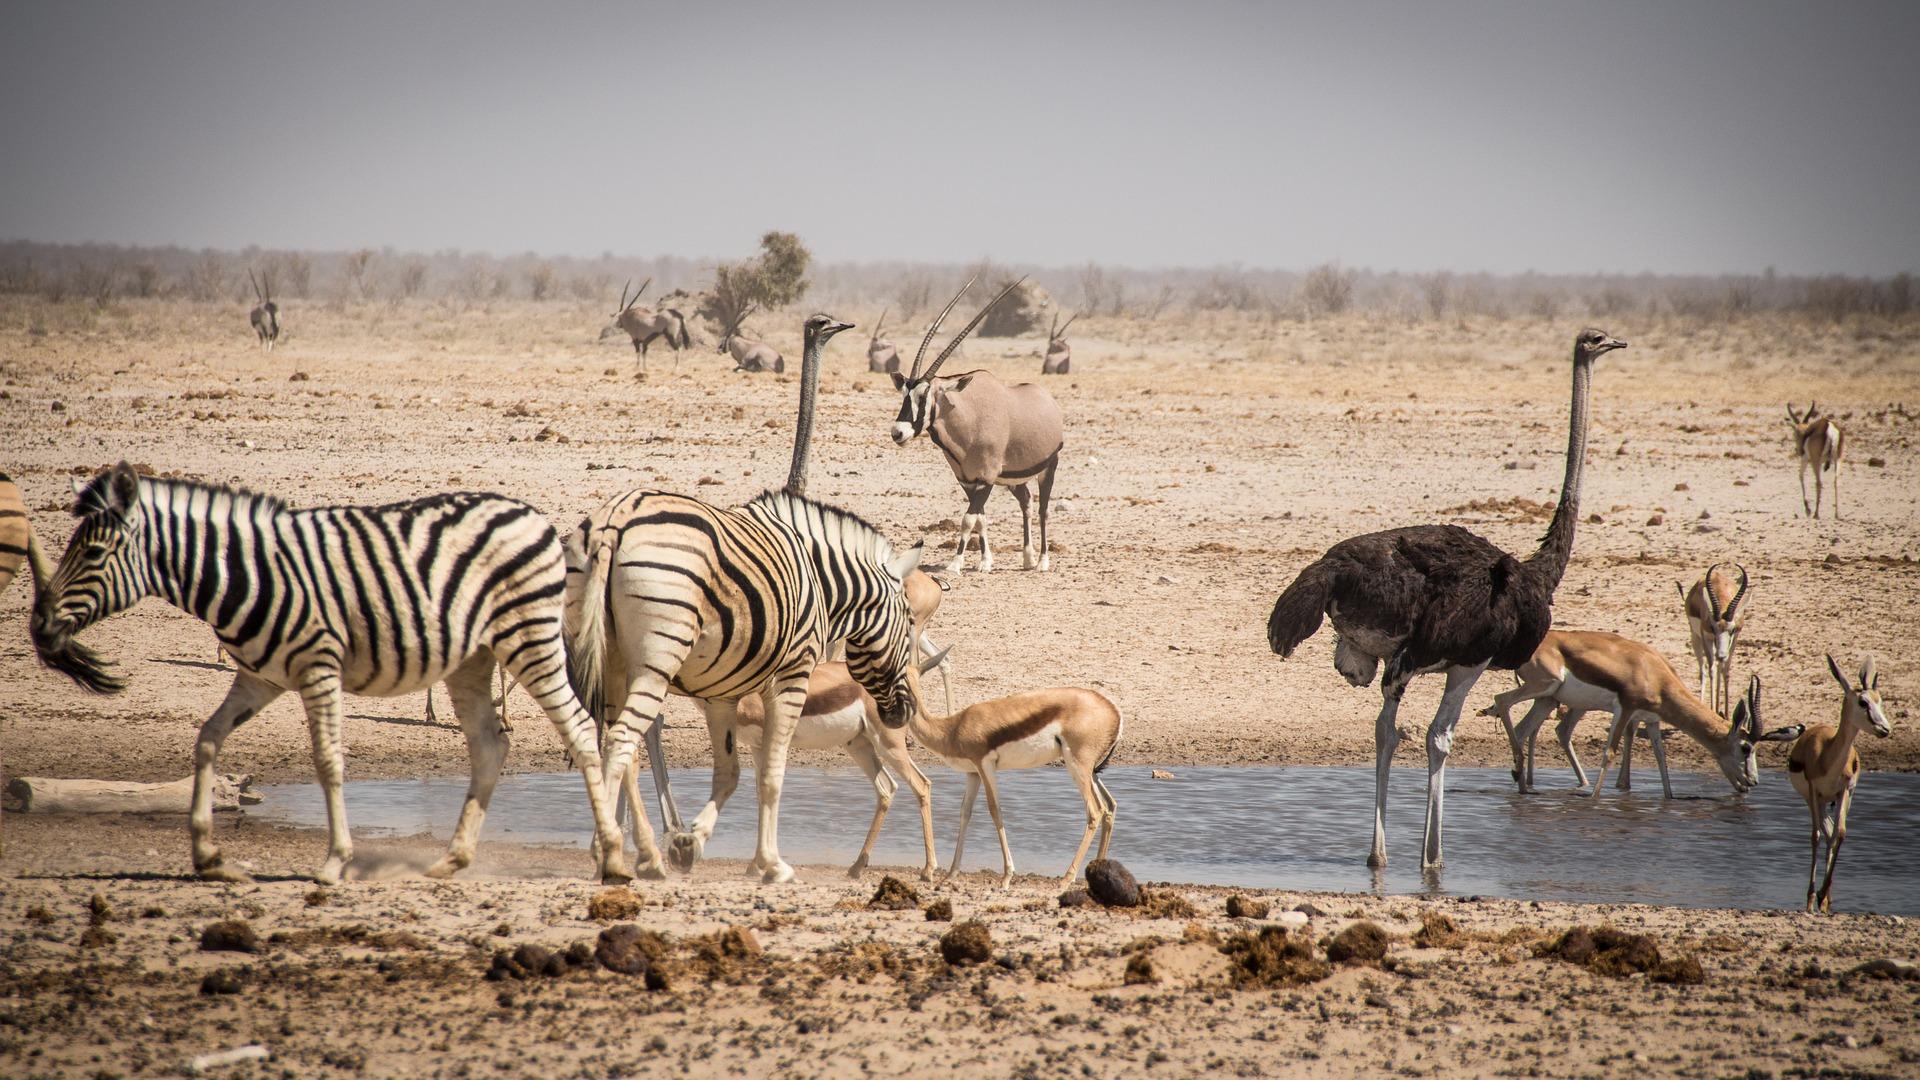 Wildlife gather at a waterhole in Etosha National Park.